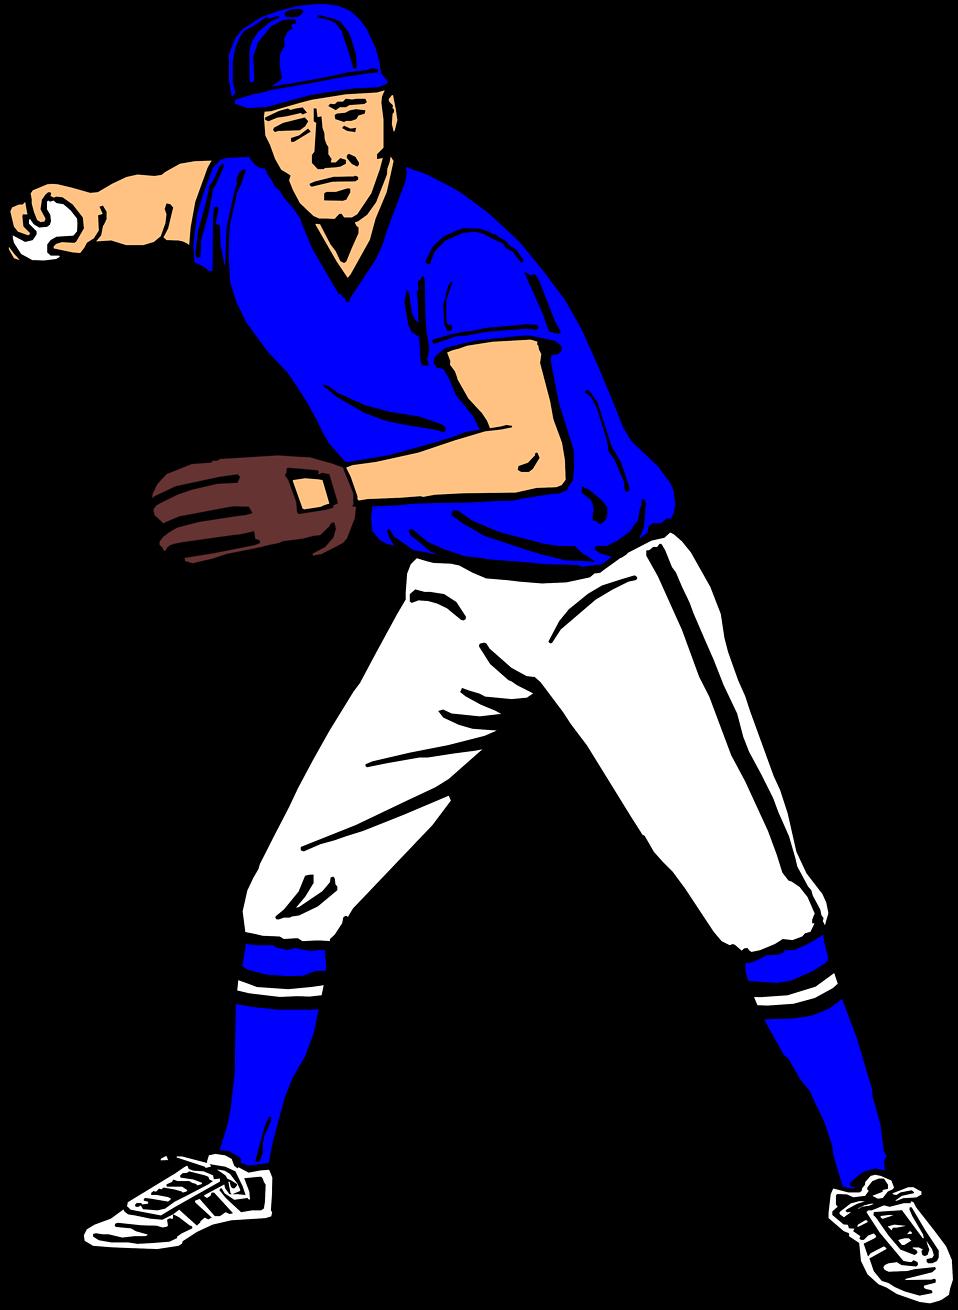 Baseball player clipart 2.